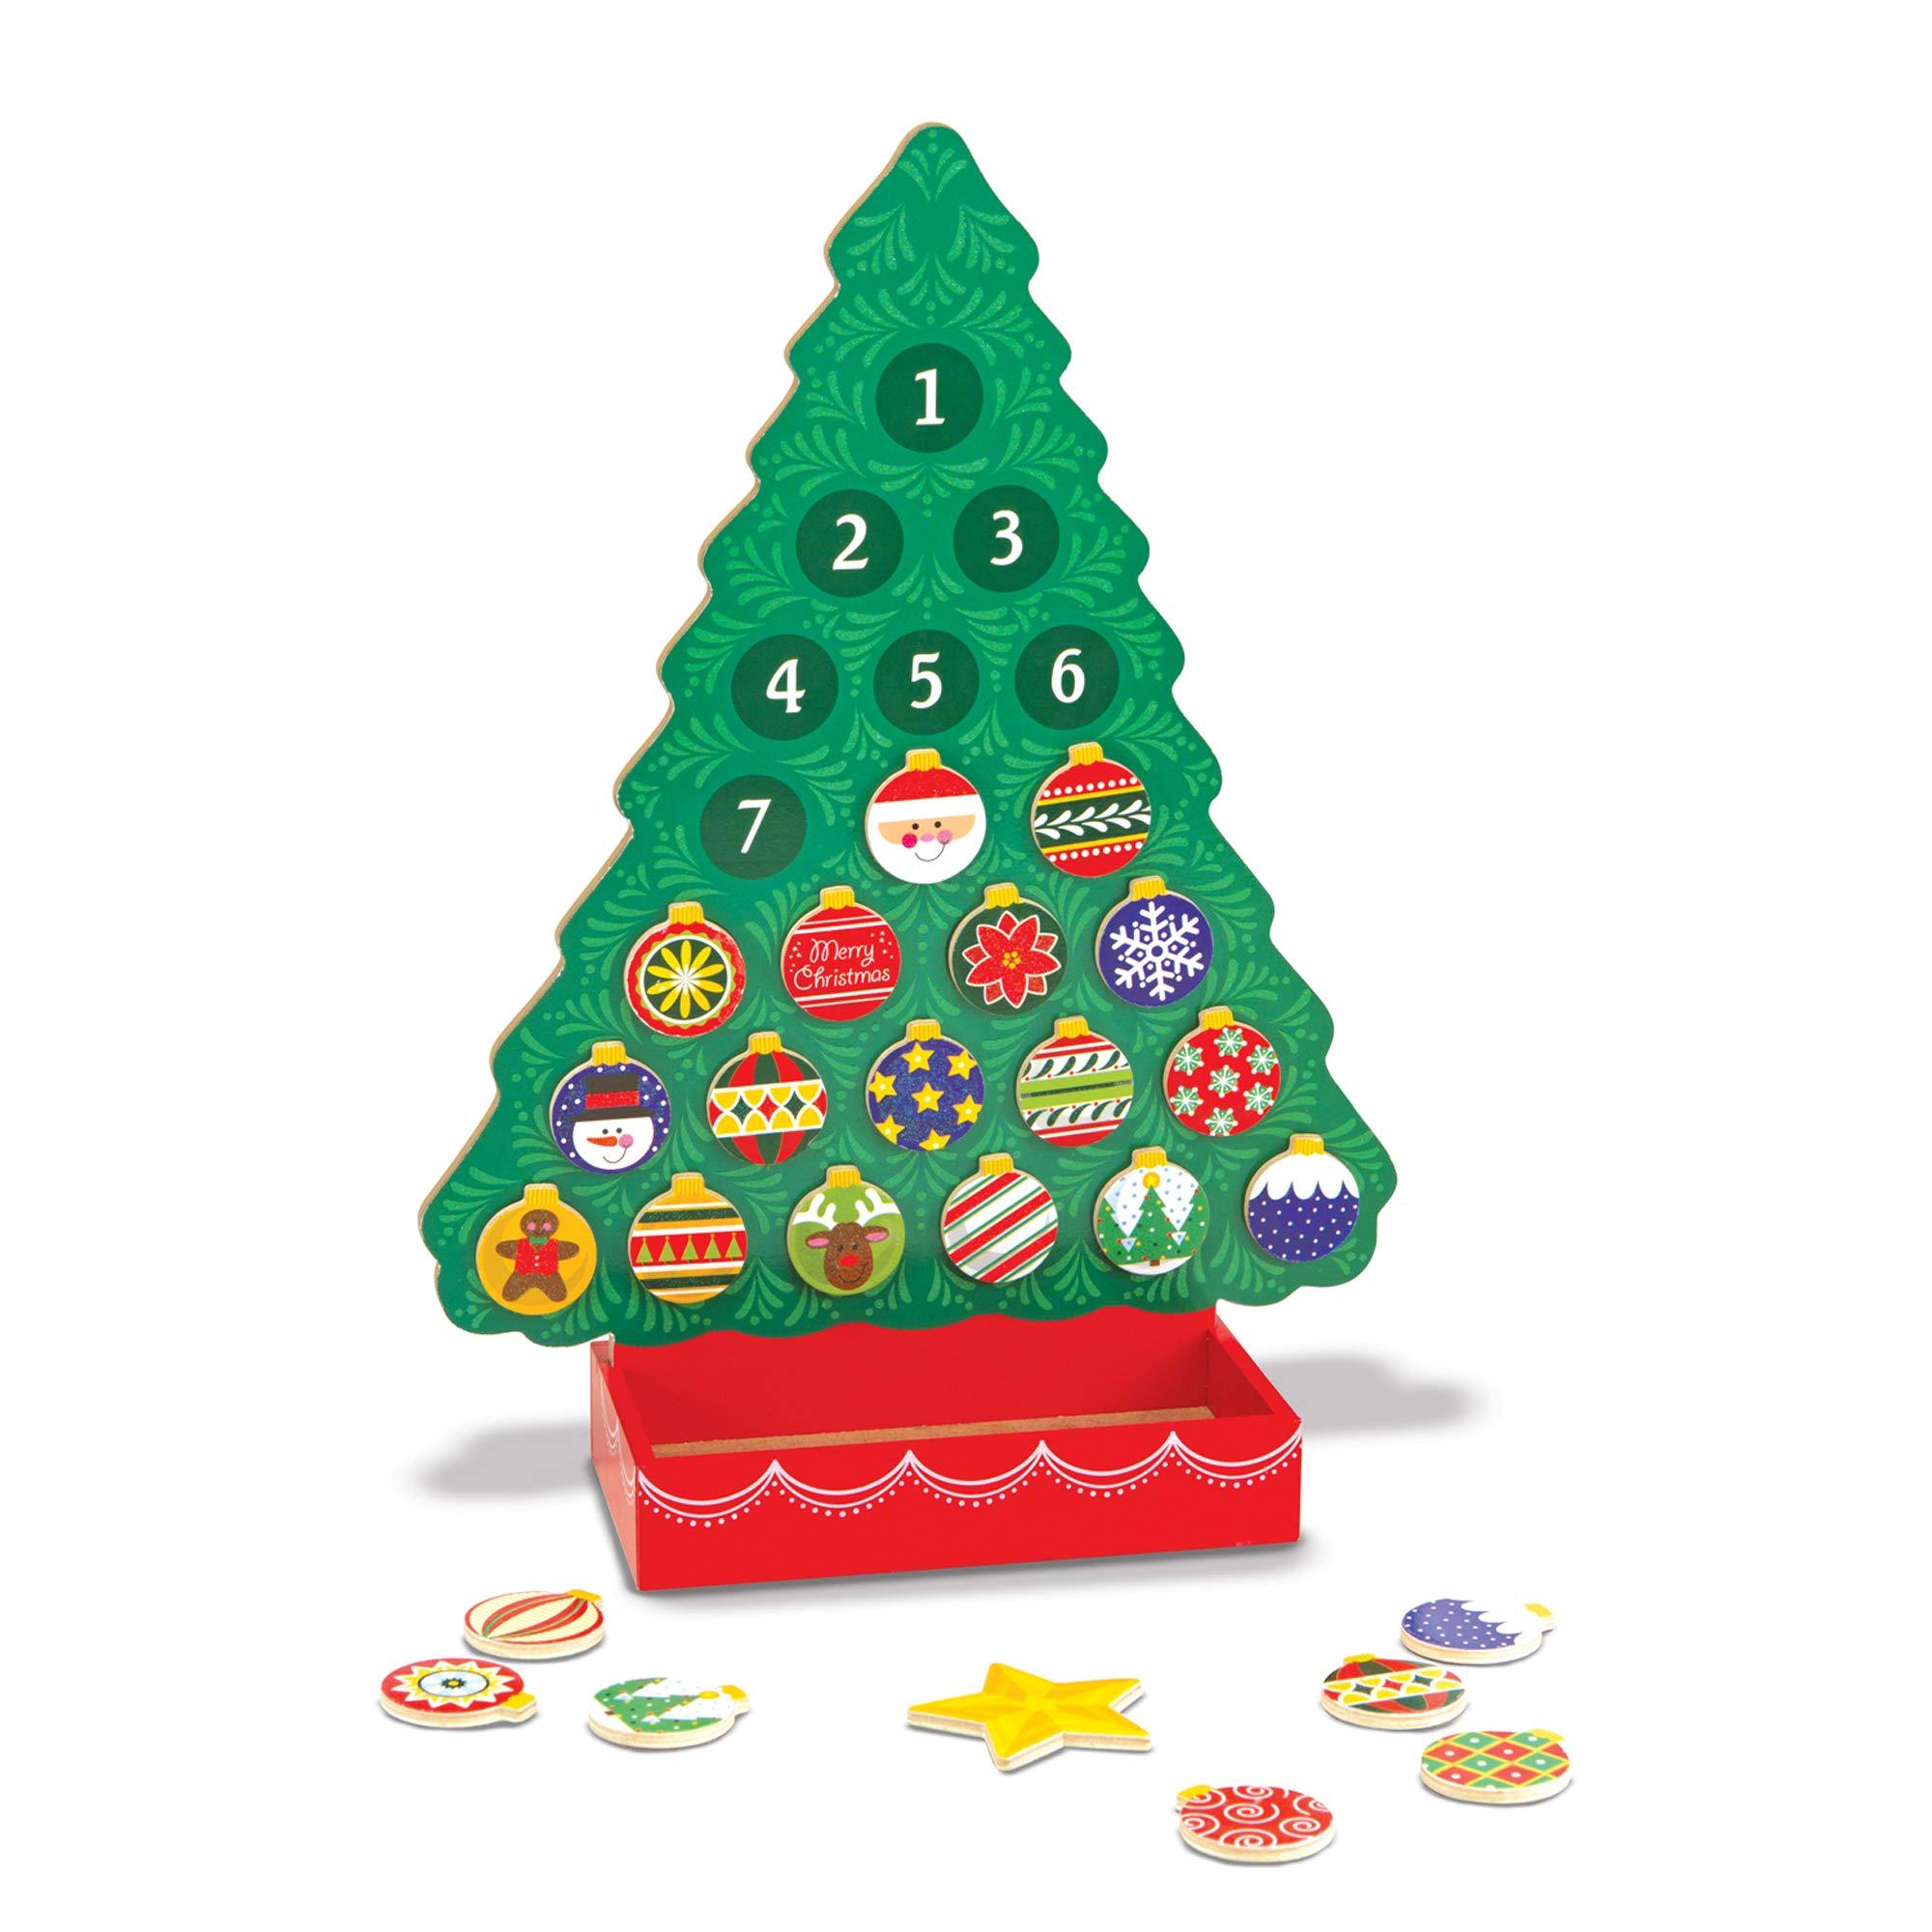 Melissa & Doug Countdown to Christmas Wooden Advent Calendar, Seasonal & Religious, Magnetic Tree, 25 Magnets, 16.5'' H x 12'' W x 4.25'' L